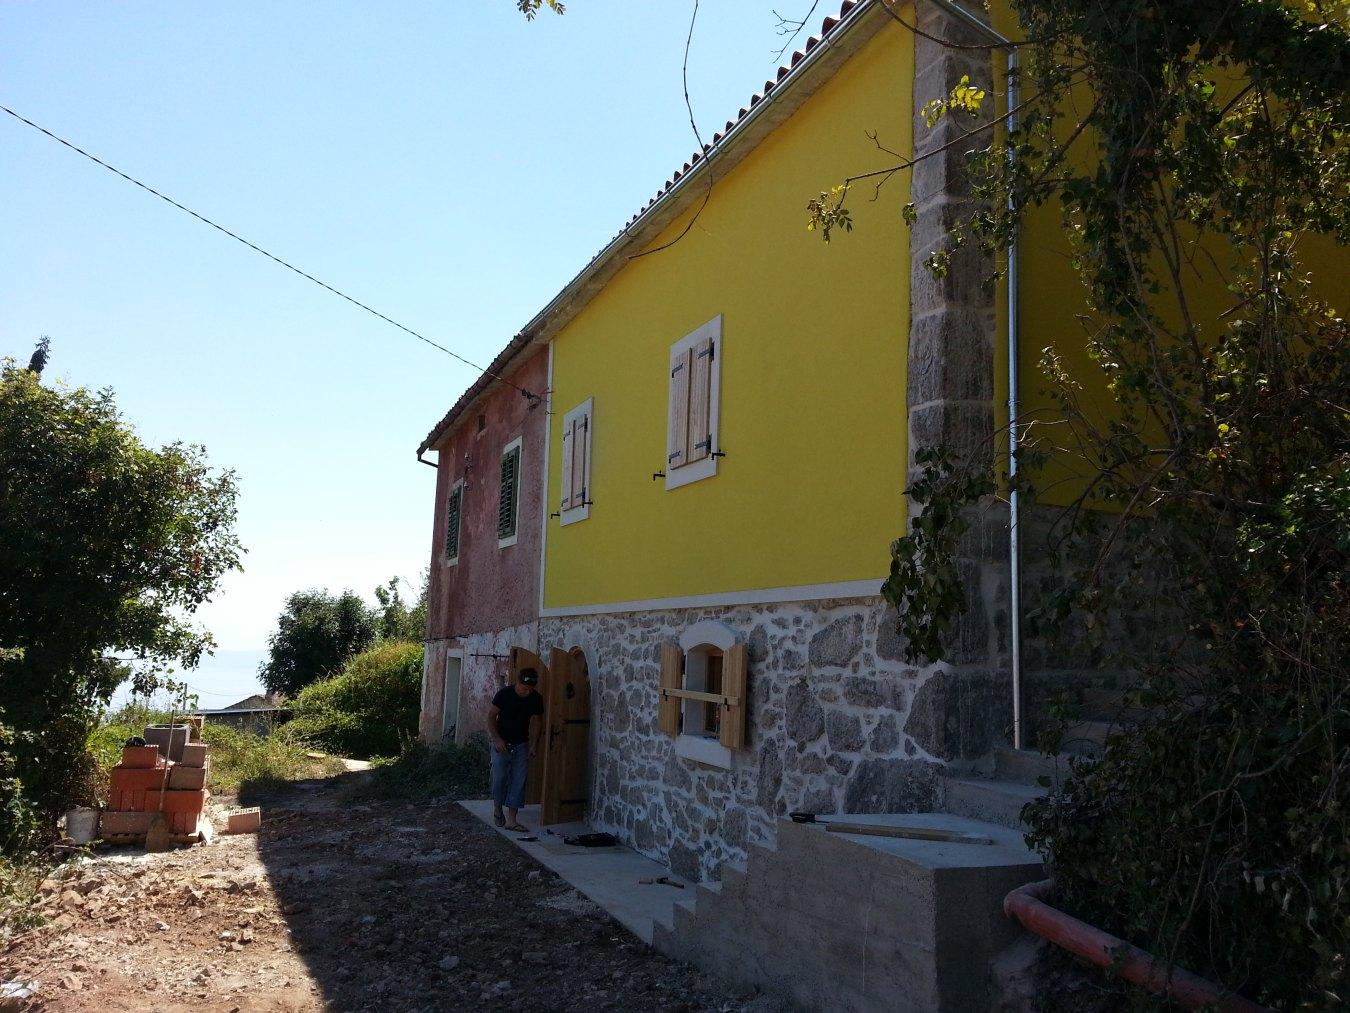 Rekonstruirana kamena kuća/Reconstructed stone house, 100m2, € 115.000